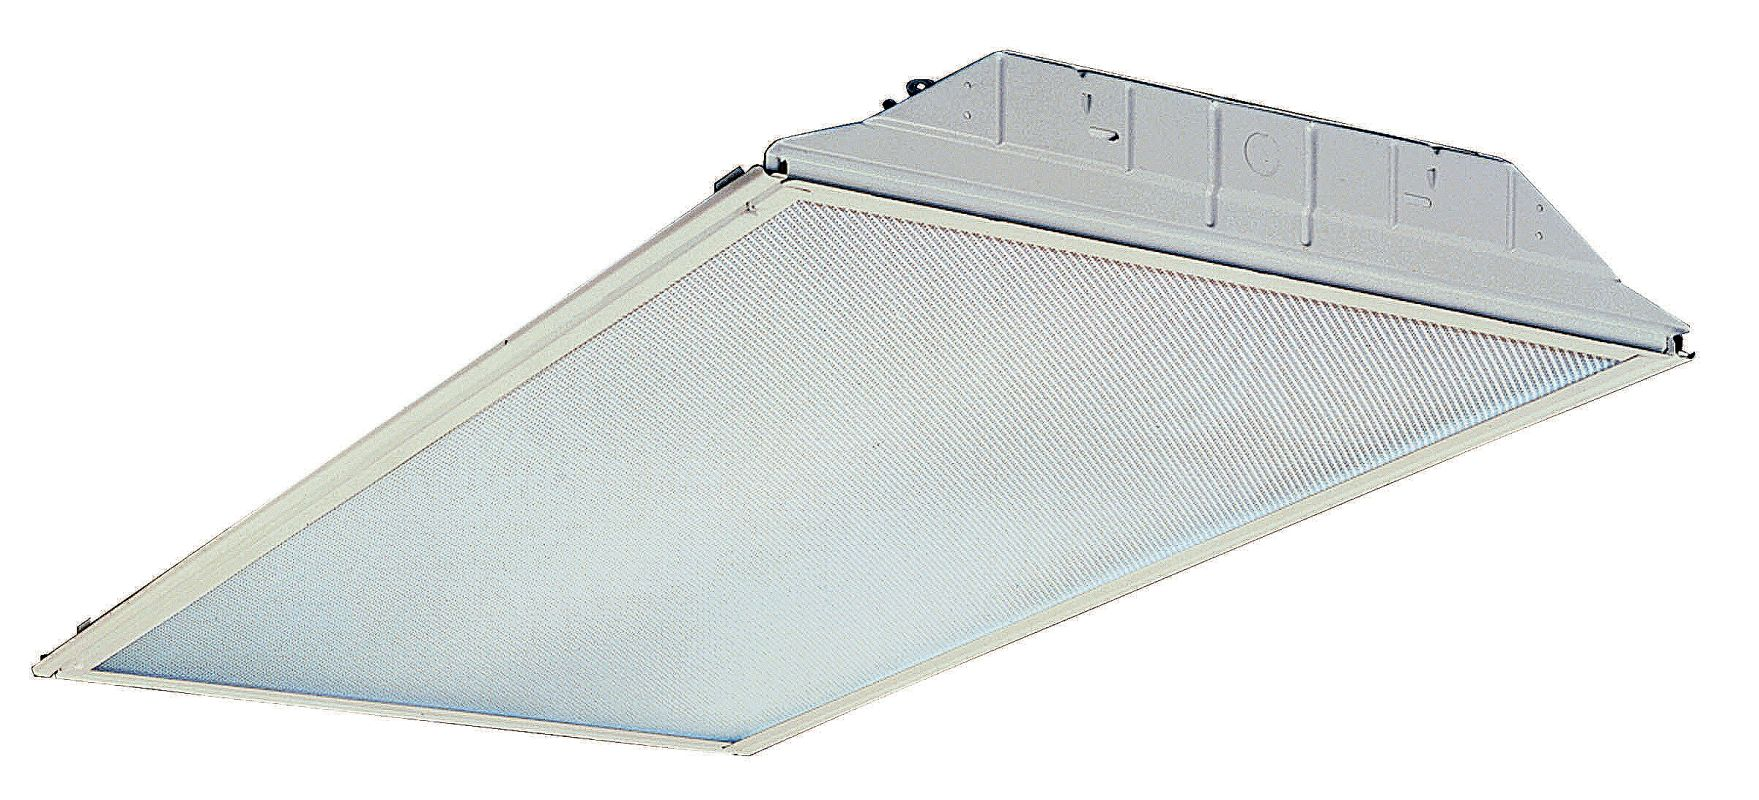 24 fluorescent light fixture t12 search. Black Bedroom Furniture Sets. Home Design Ideas